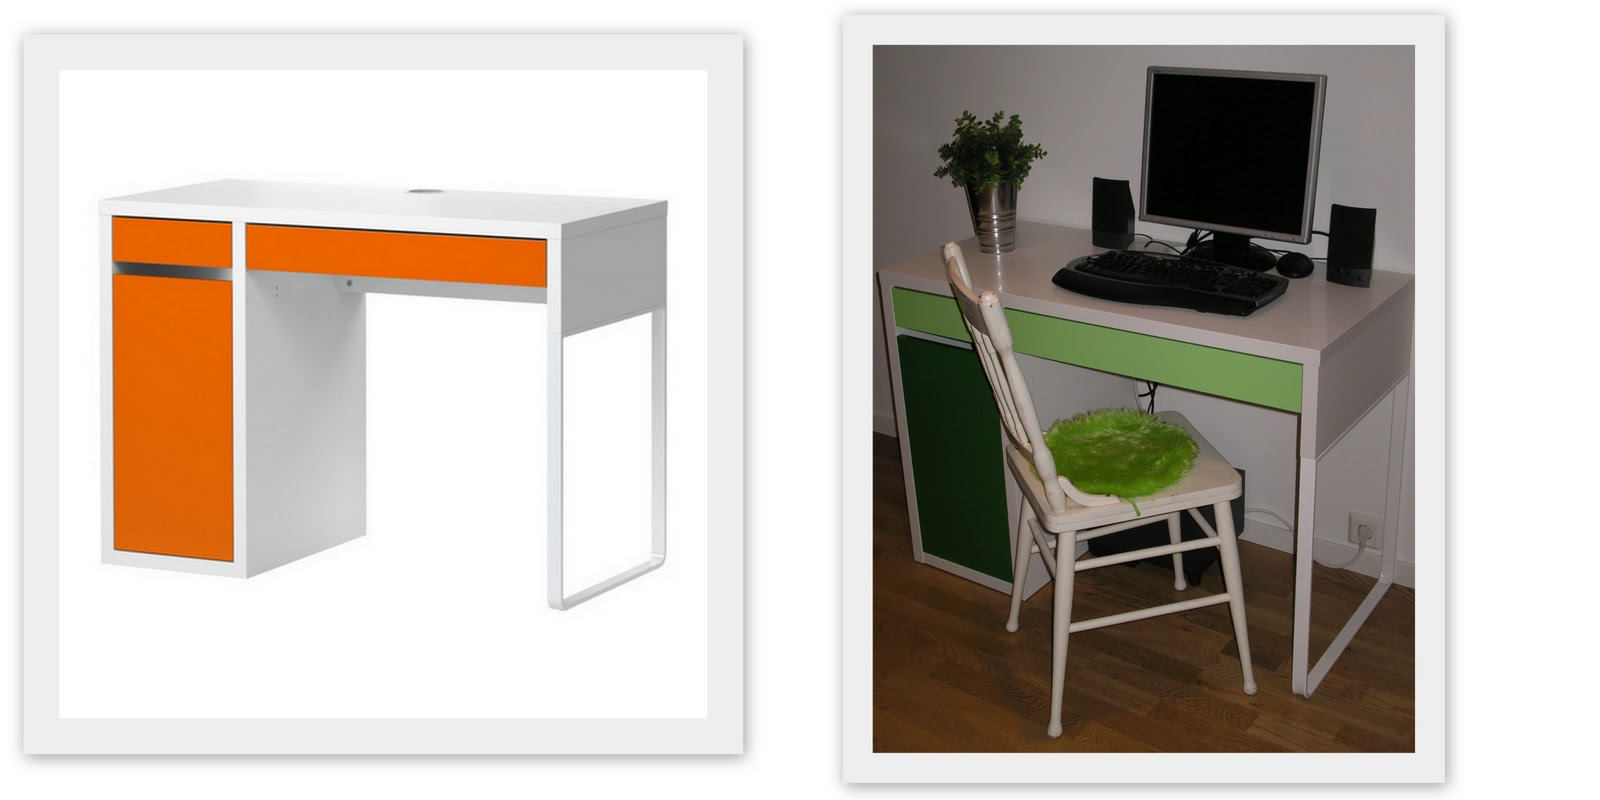 designfruen pimp my ikea. Black Bedroom Furniture Sets. Home Design Ideas